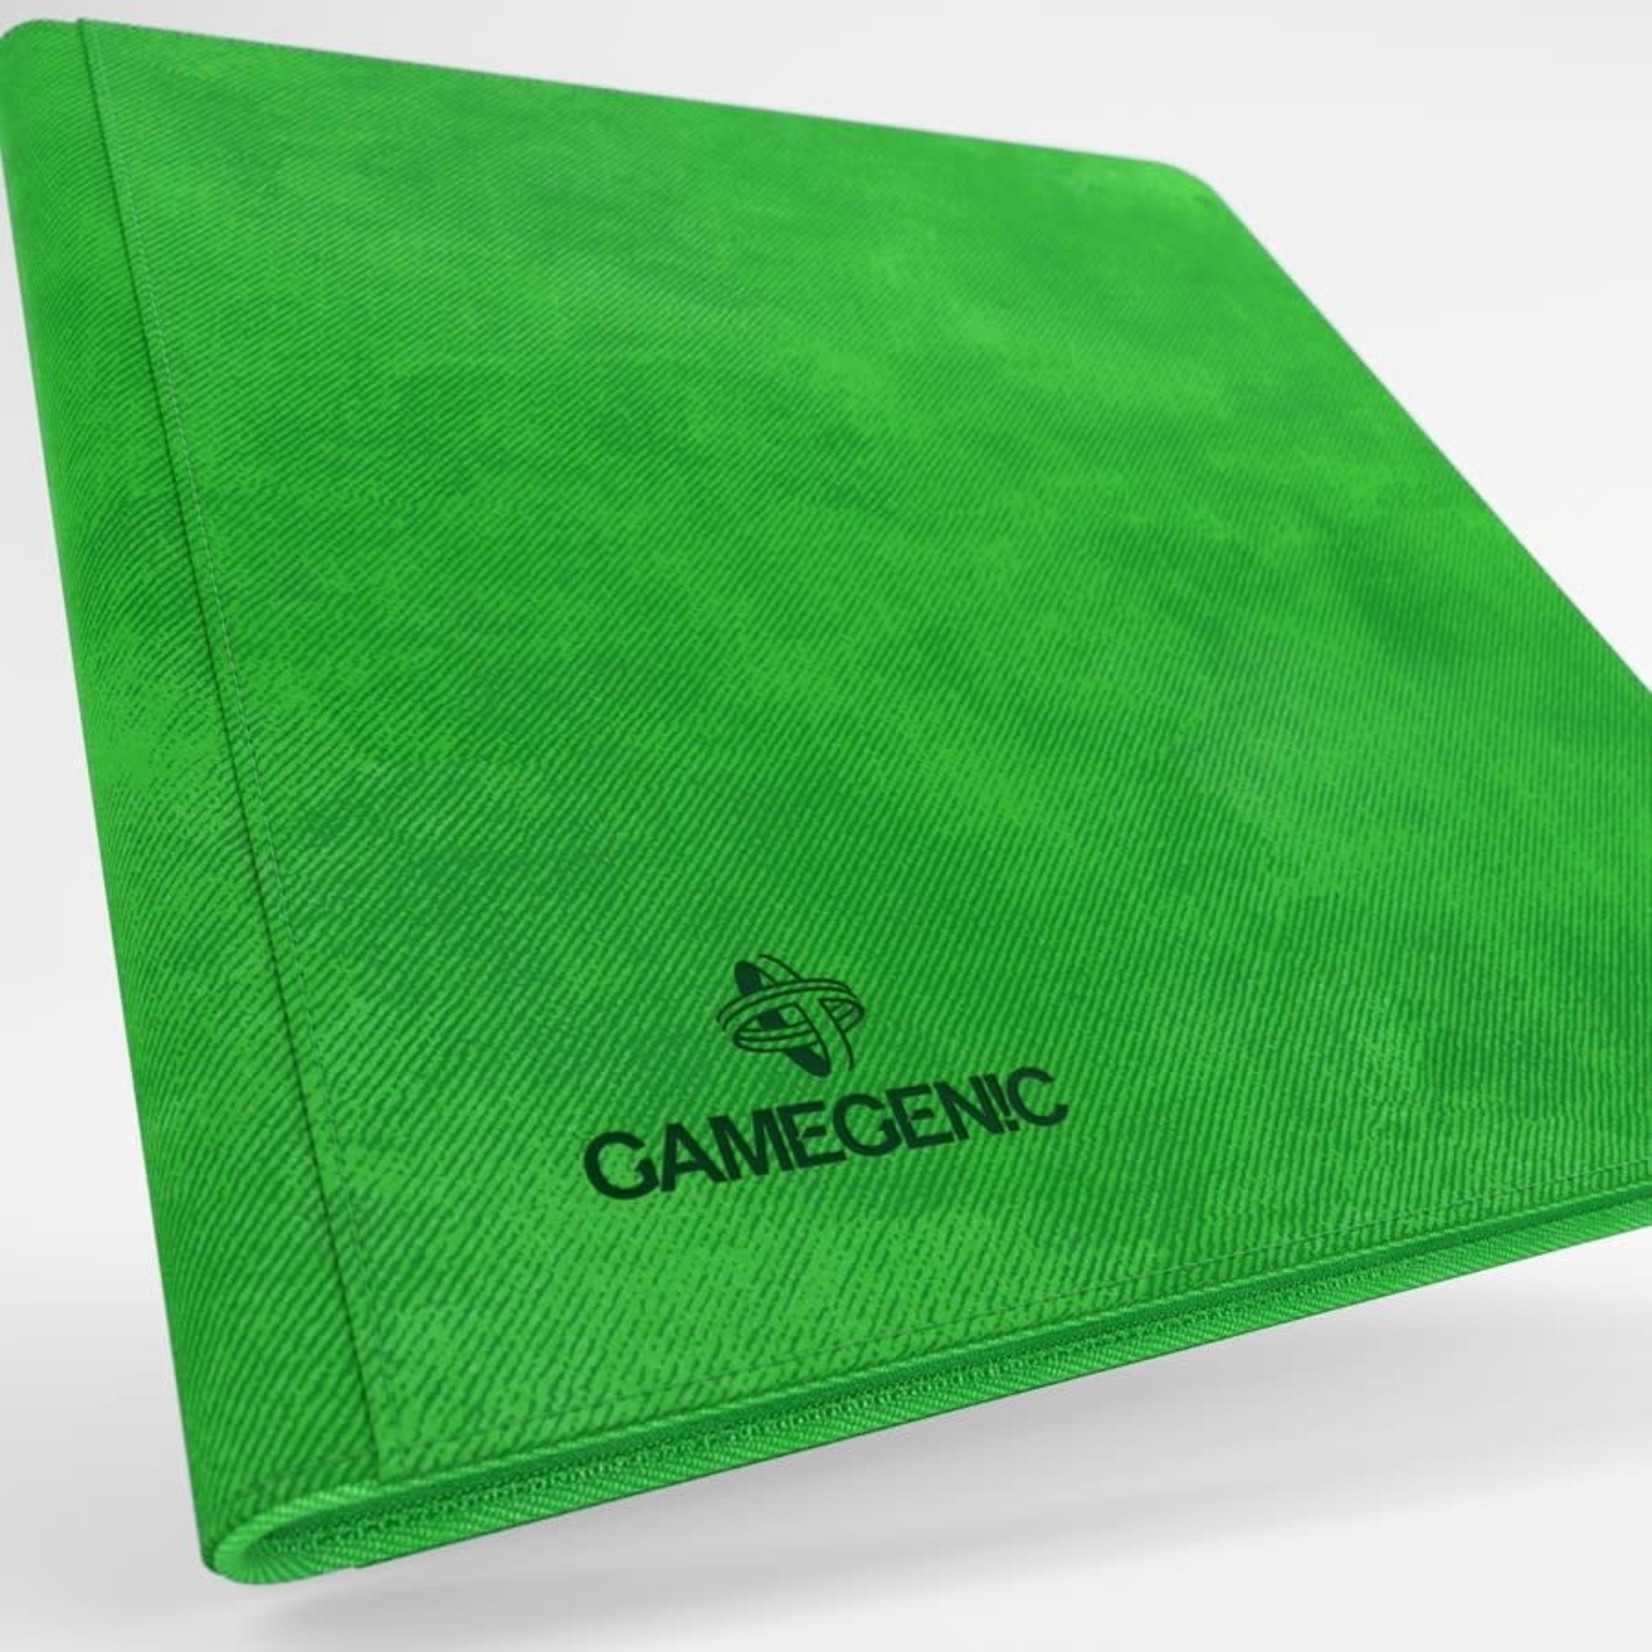 Asmodee GameGenic Zip Up album 12 Pocket Green (24)